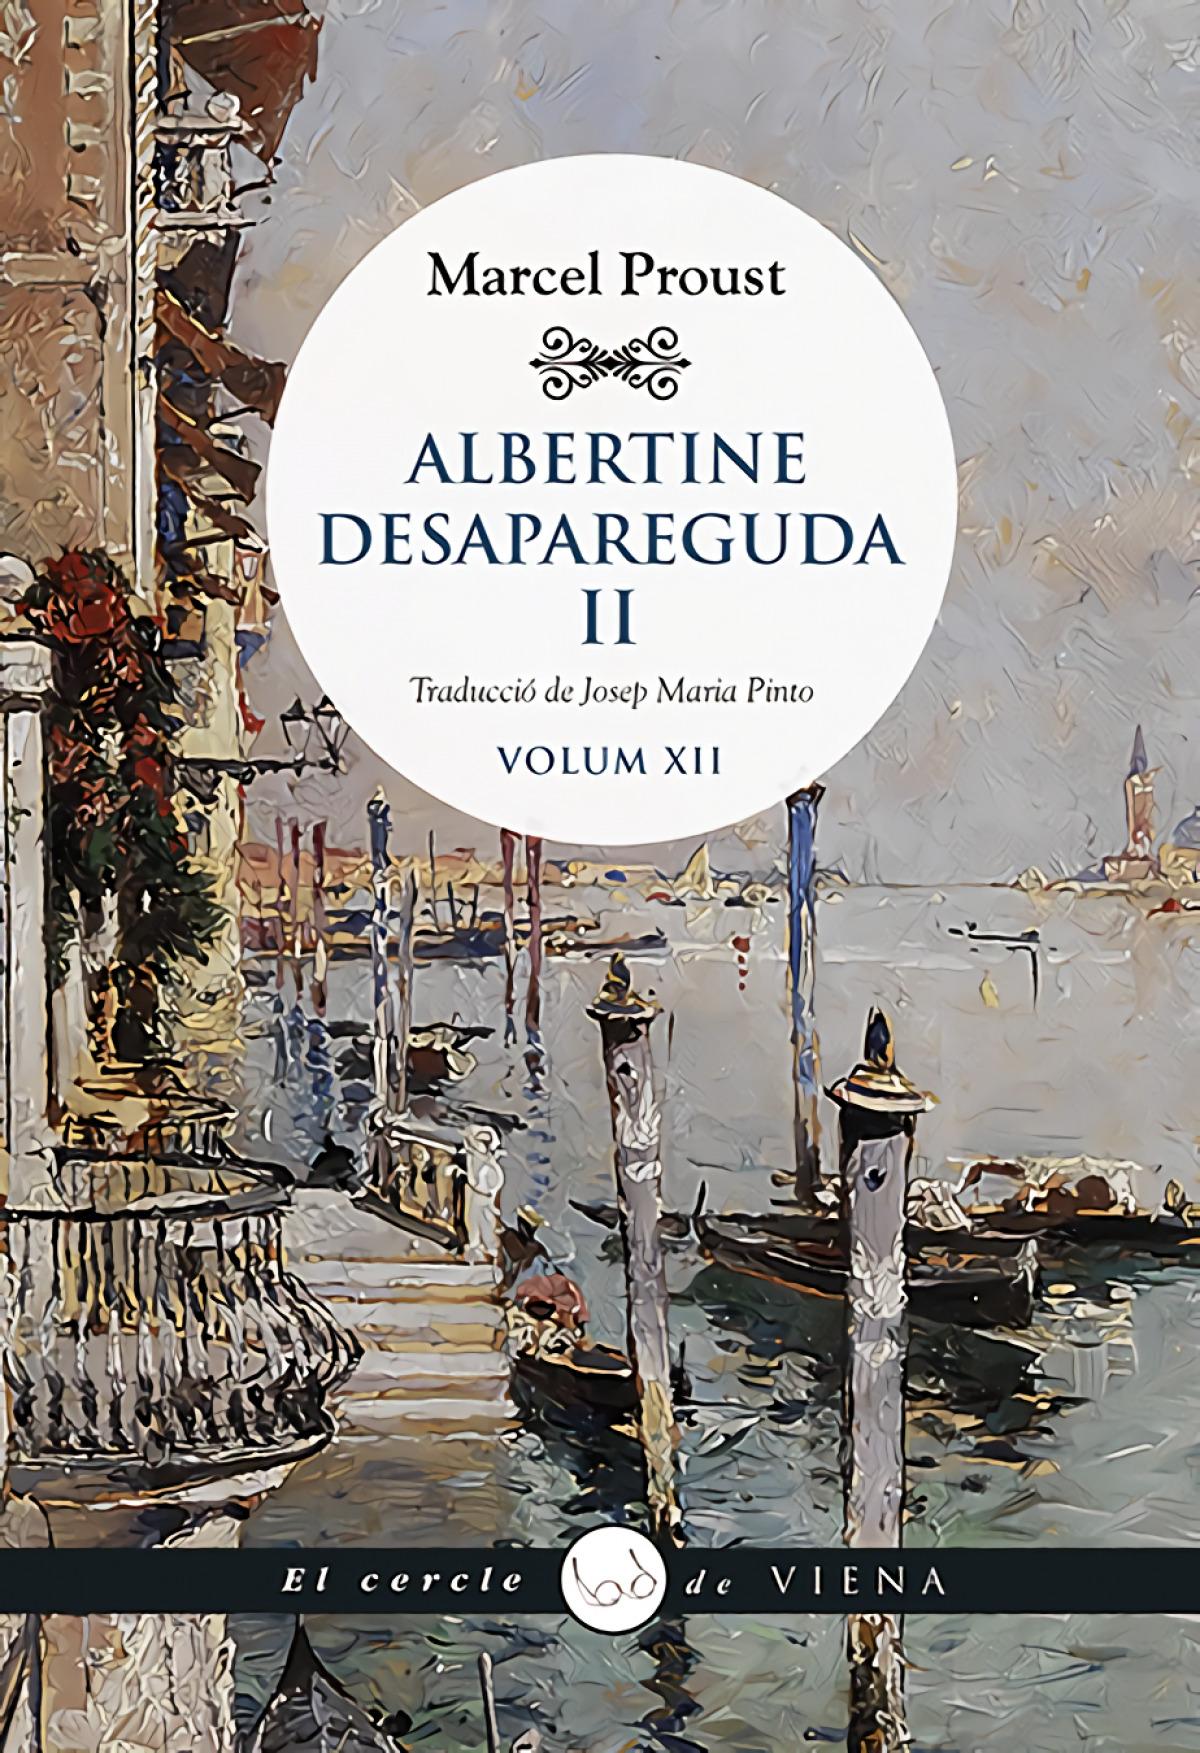 Albertine desapareguda II